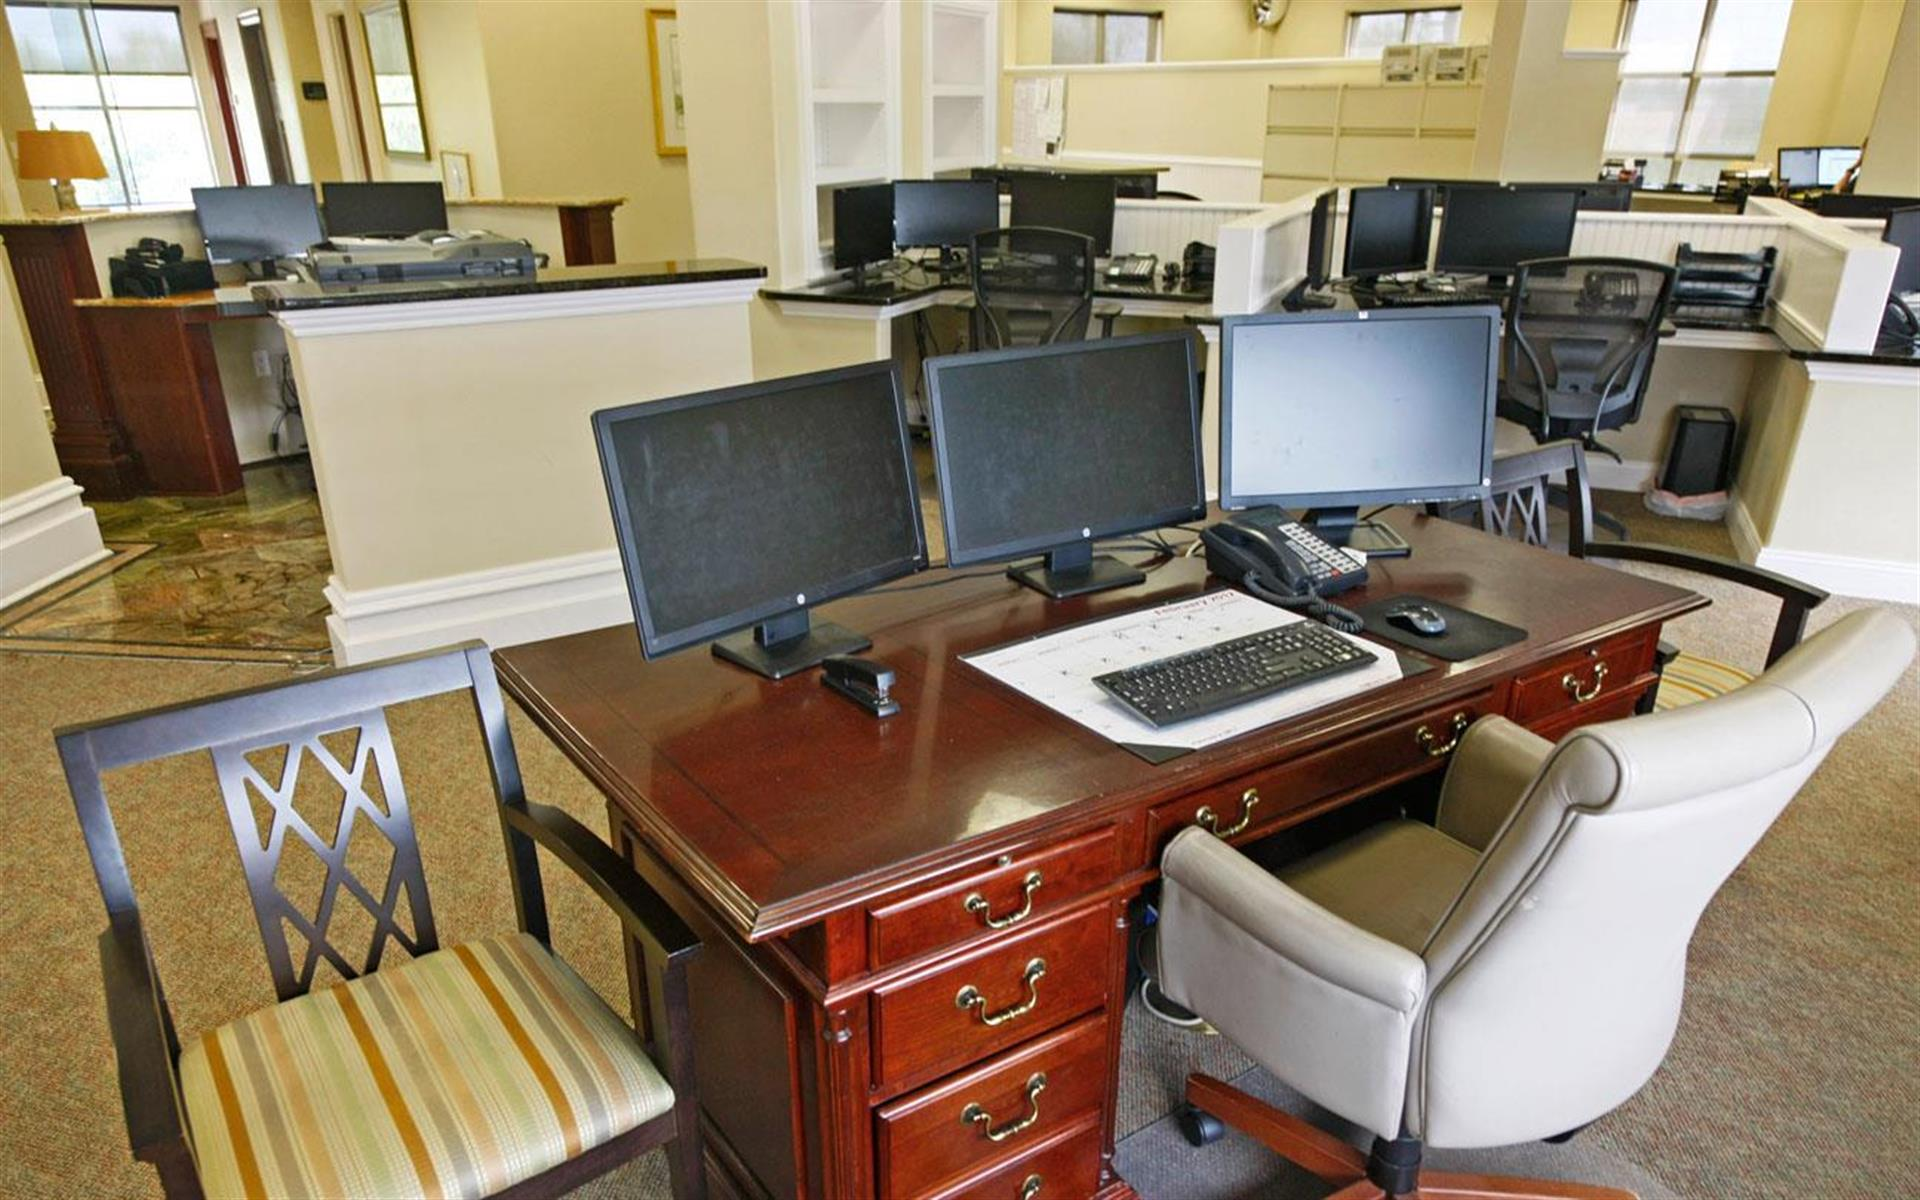 The Dixon Building - Desk with 3 monitors